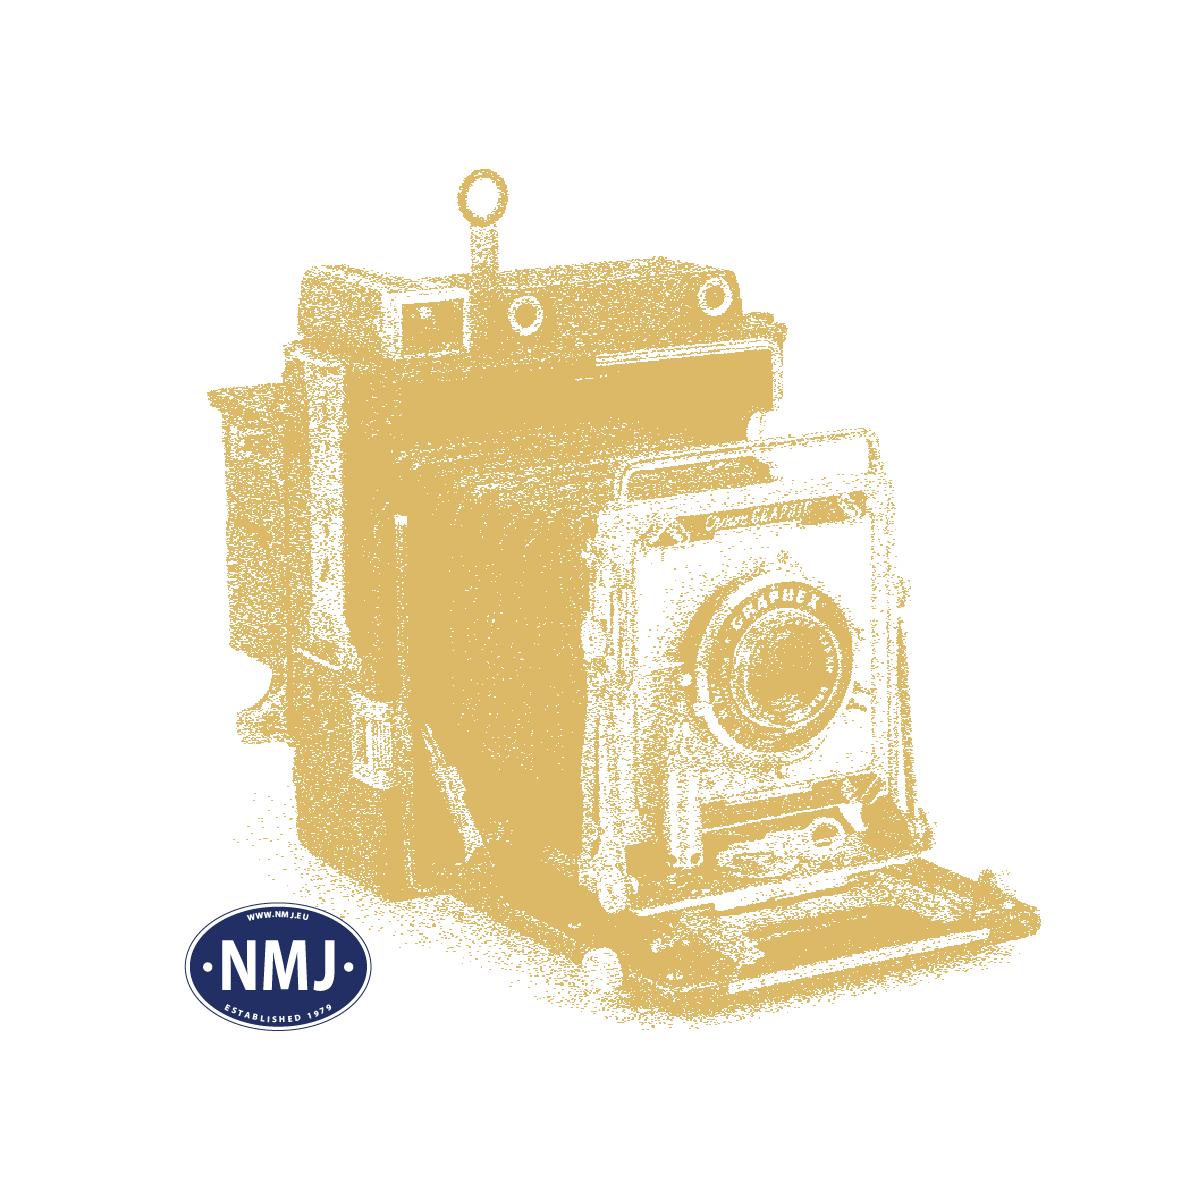 NMJST34907 - NMJ Superline NSB T3 4907 Stakevogn m/ Bremseplattform